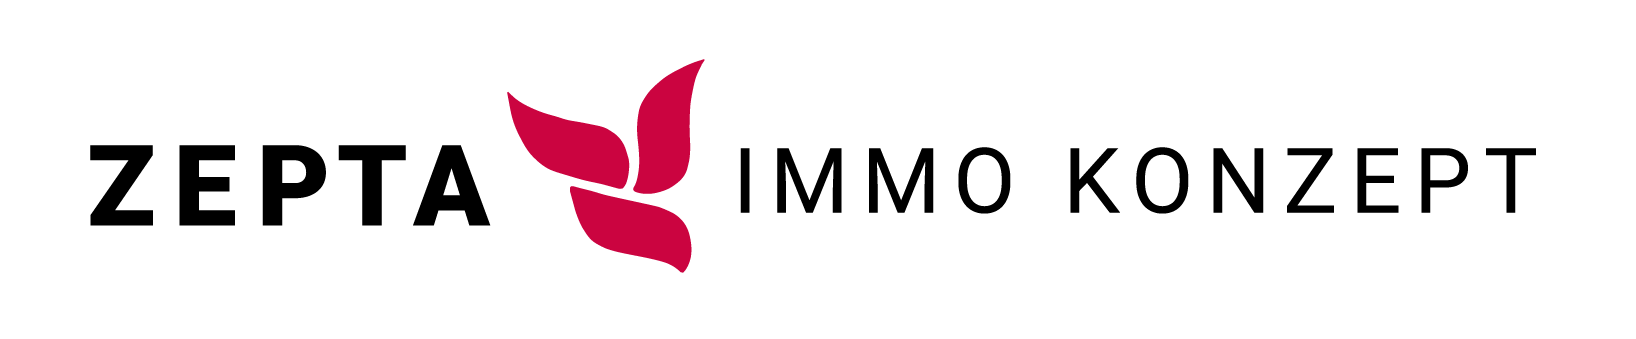 Logo Zepta Immo Konzept